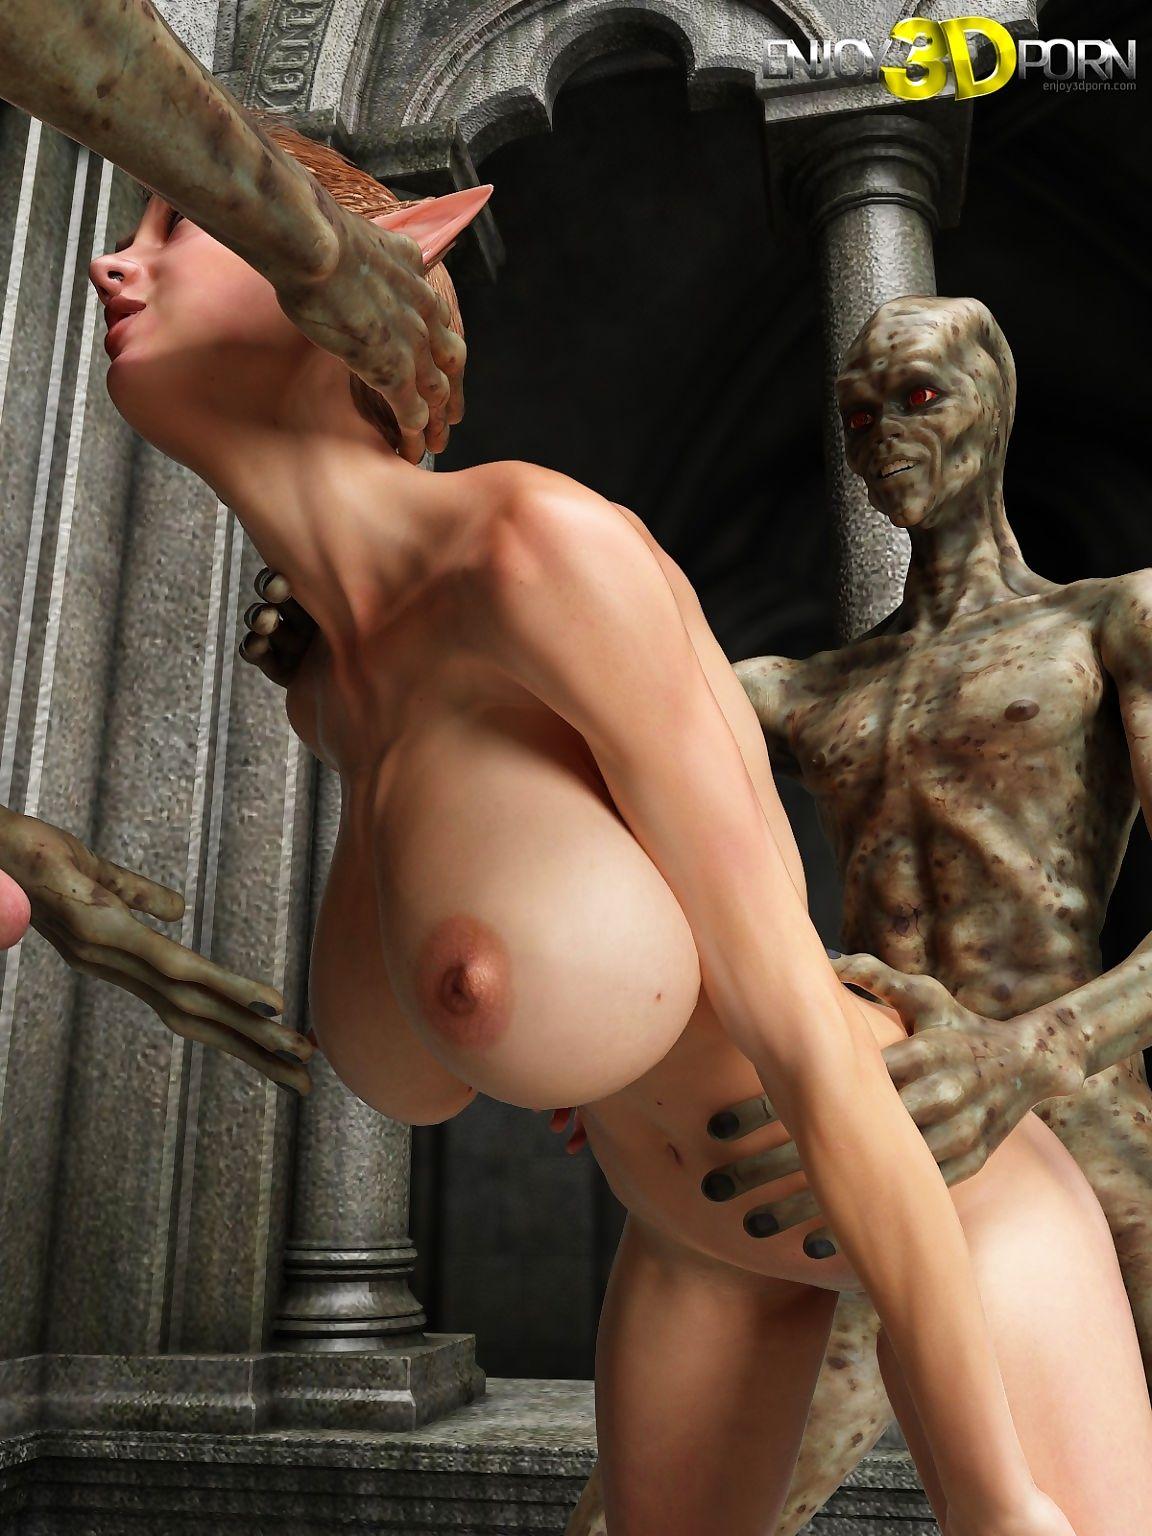 One aliens fucks slutty elven mollycoddle - loyalty 11